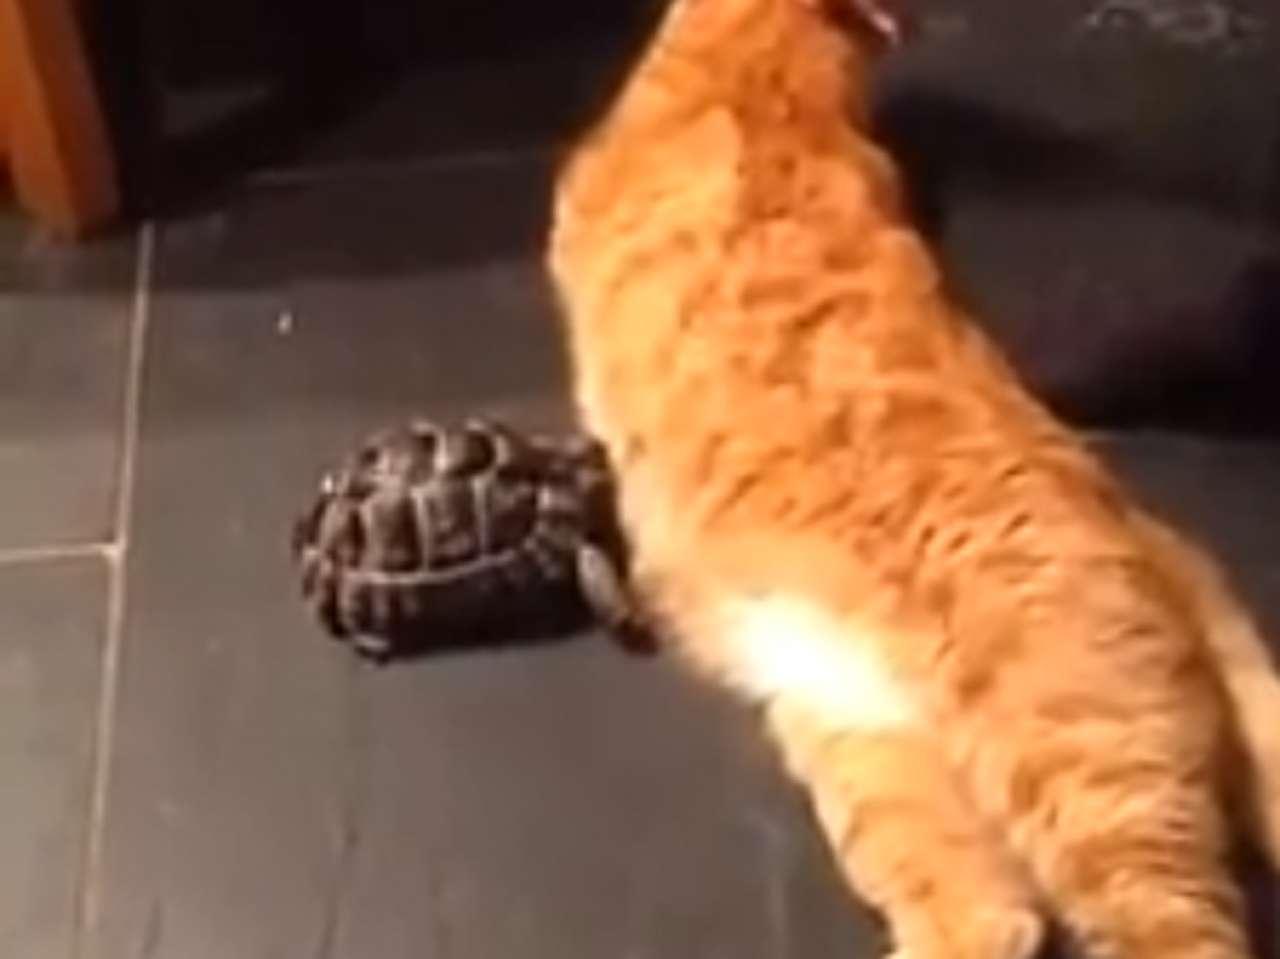 Tortuga acosa insistentemente a un gato. Foto: Facebook